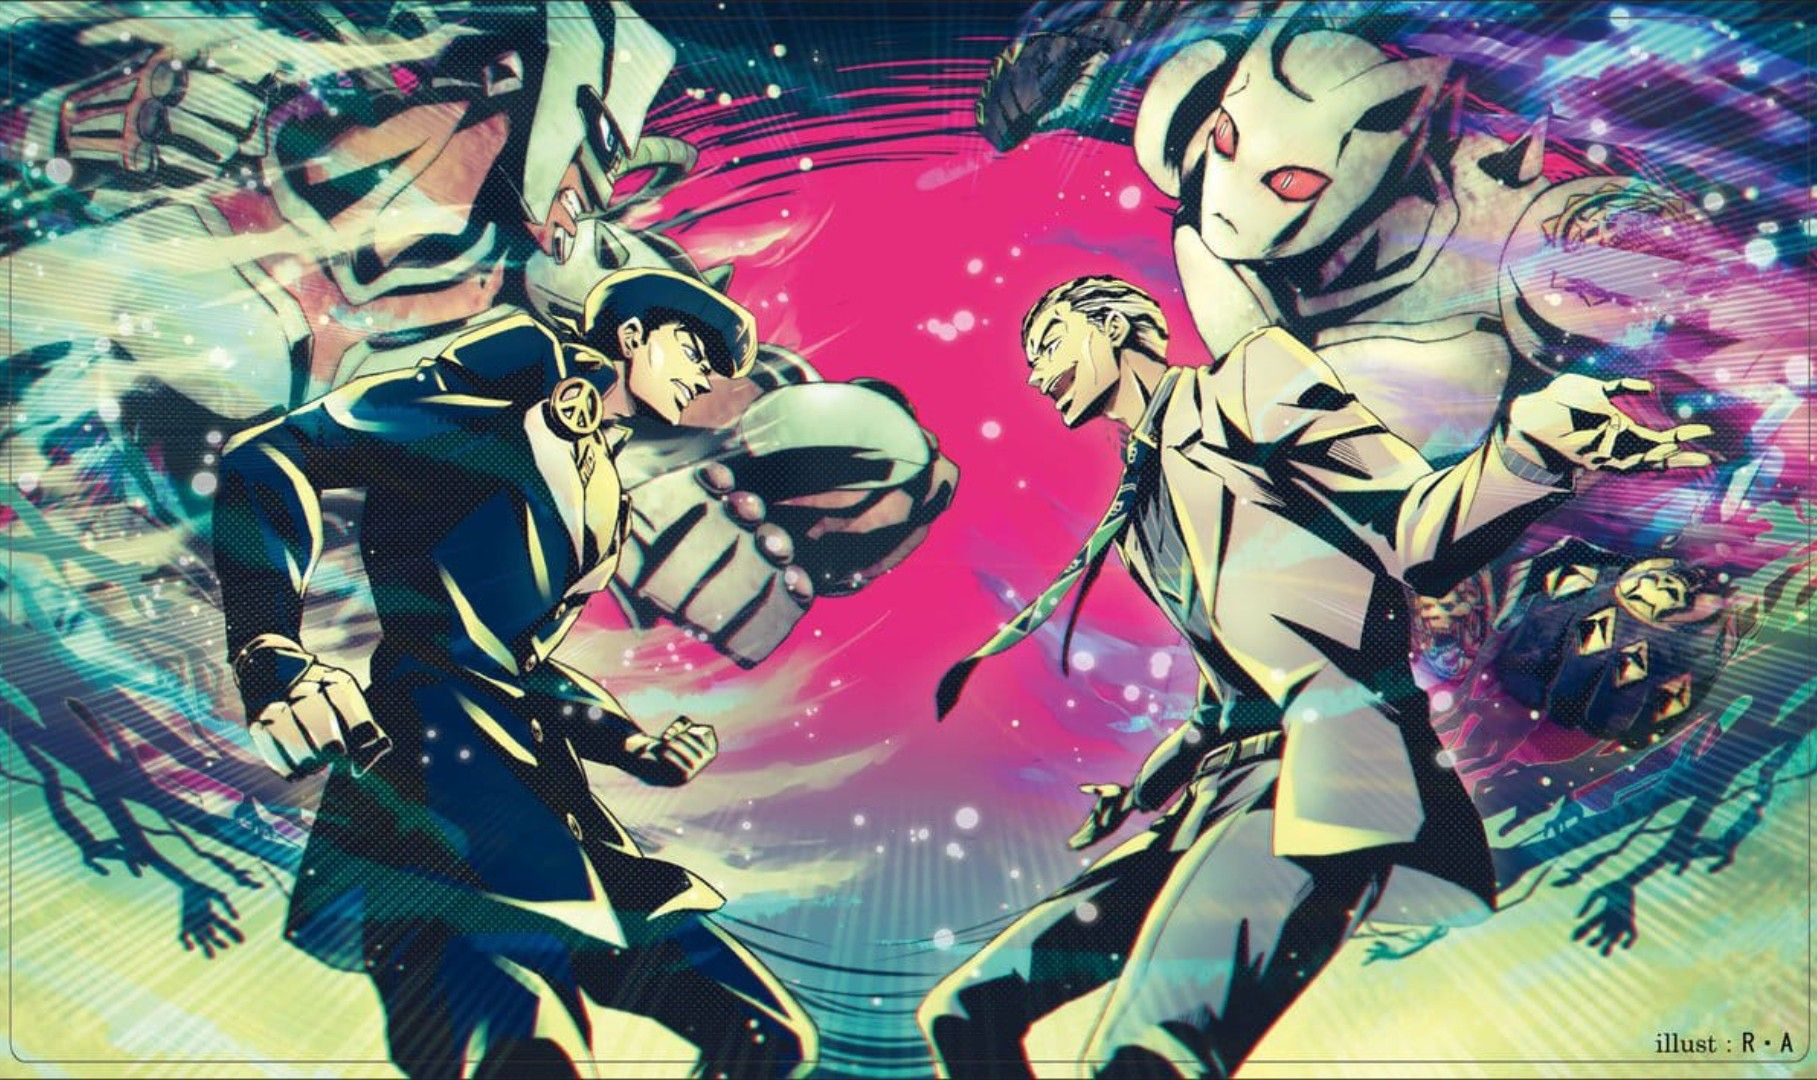 Pin By Chase Rashid On Anime Mangas Jojo S Bizarre Adventure Anime Jojo Bizarre Jojos Bizarre Adventure Jotaro